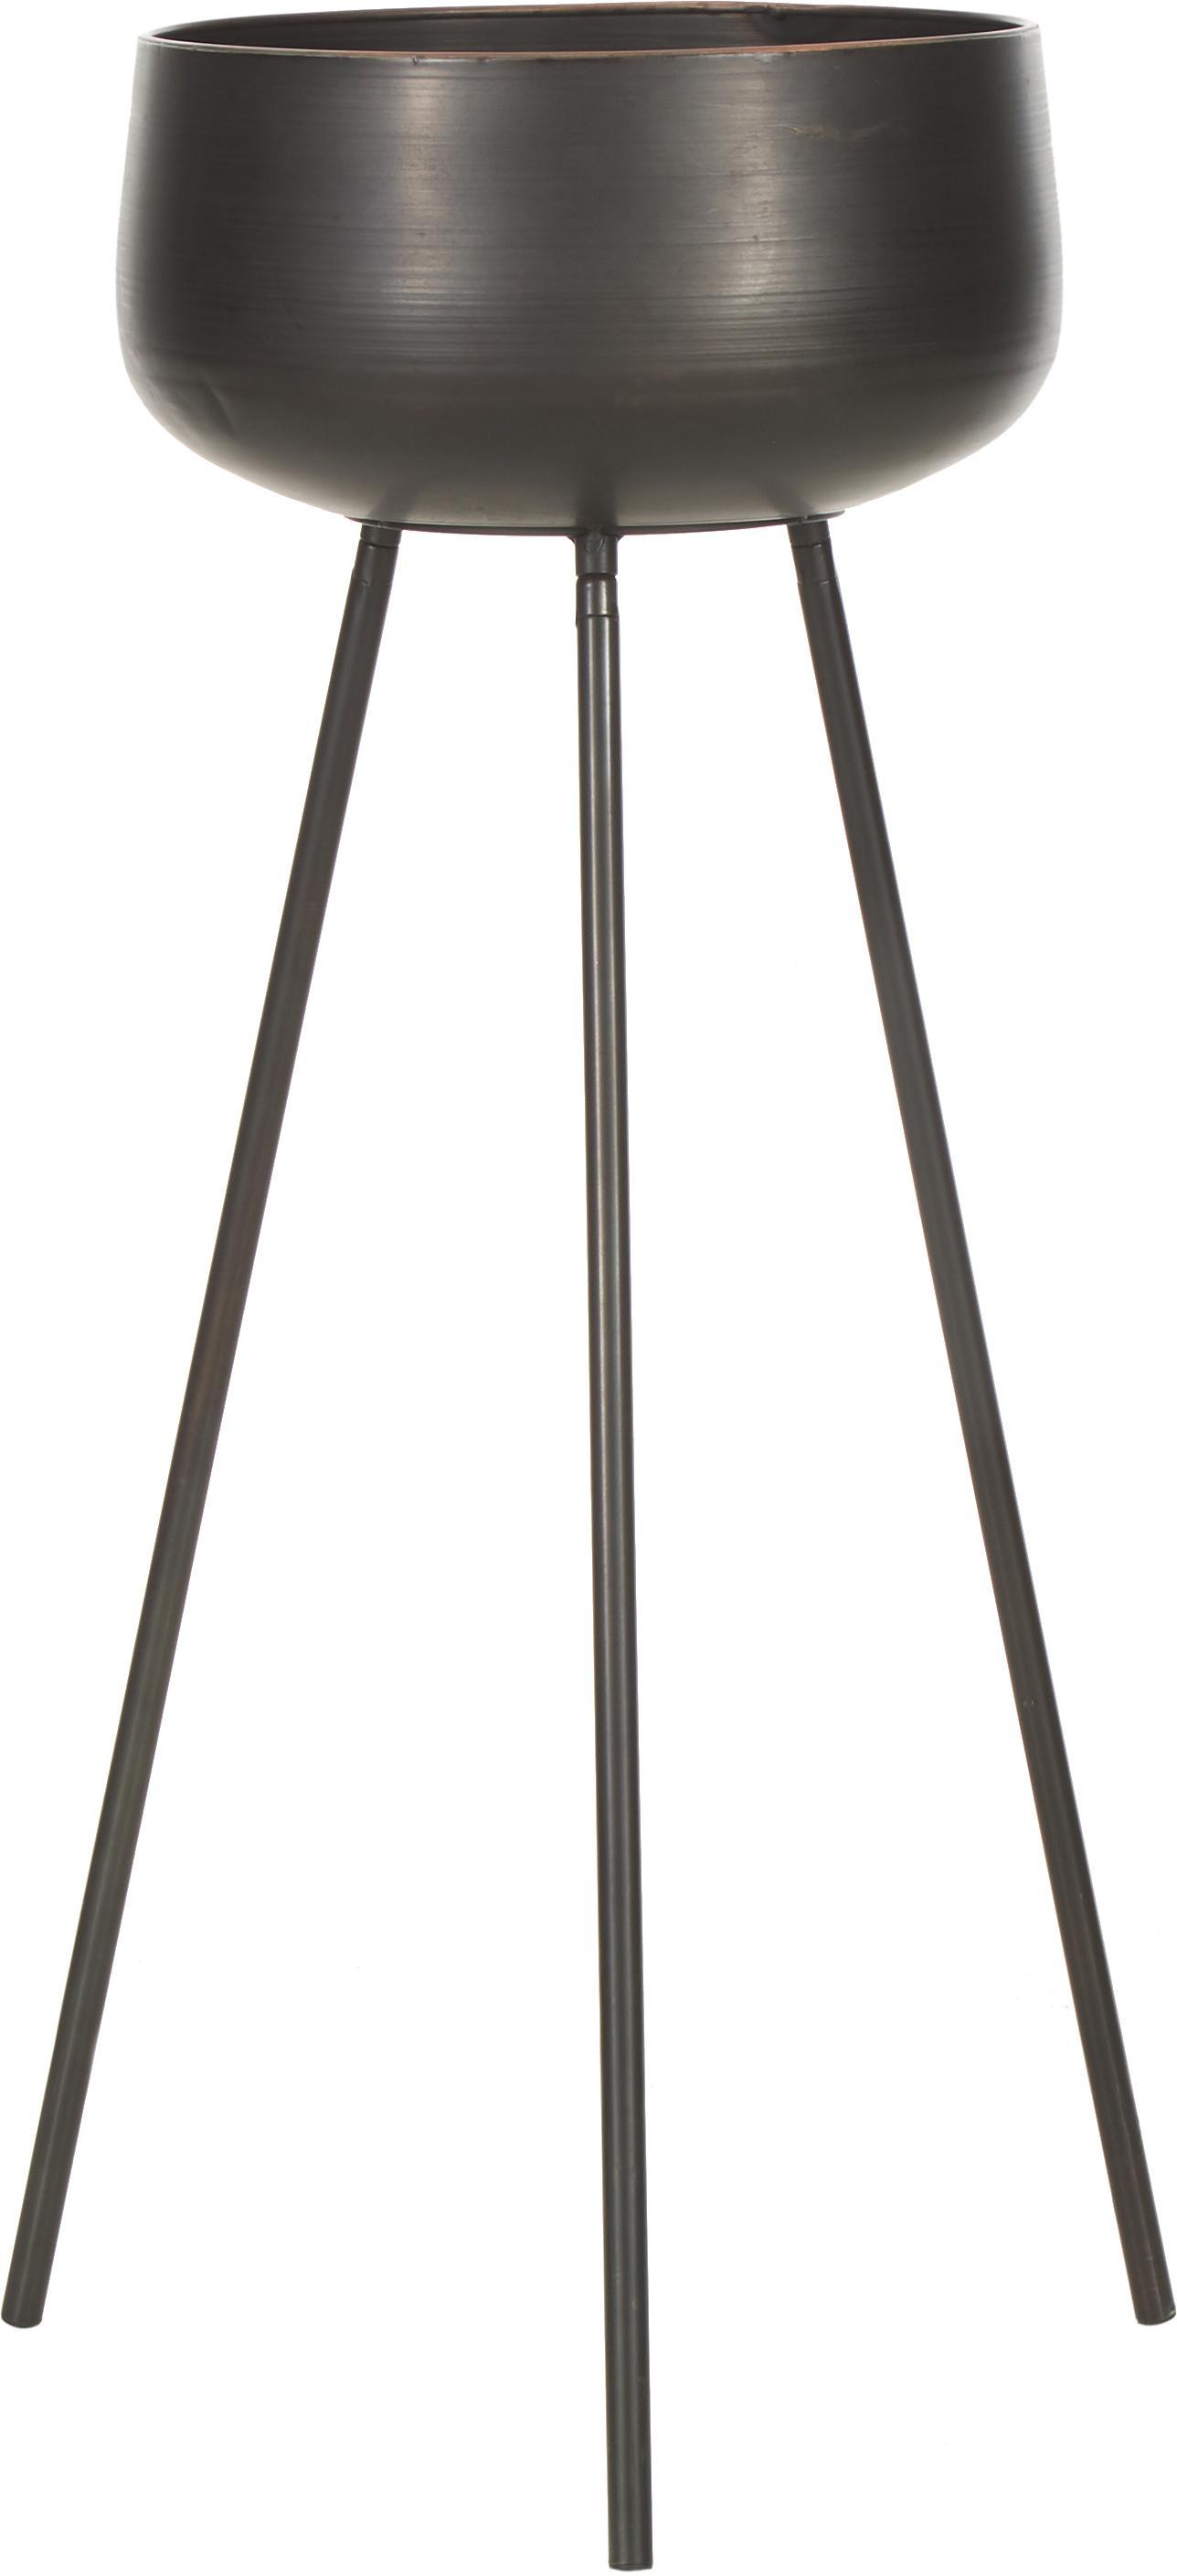 Set 2 portavasi in metallo Chimp, Metallo rivestito, Nero, Set in varie misure